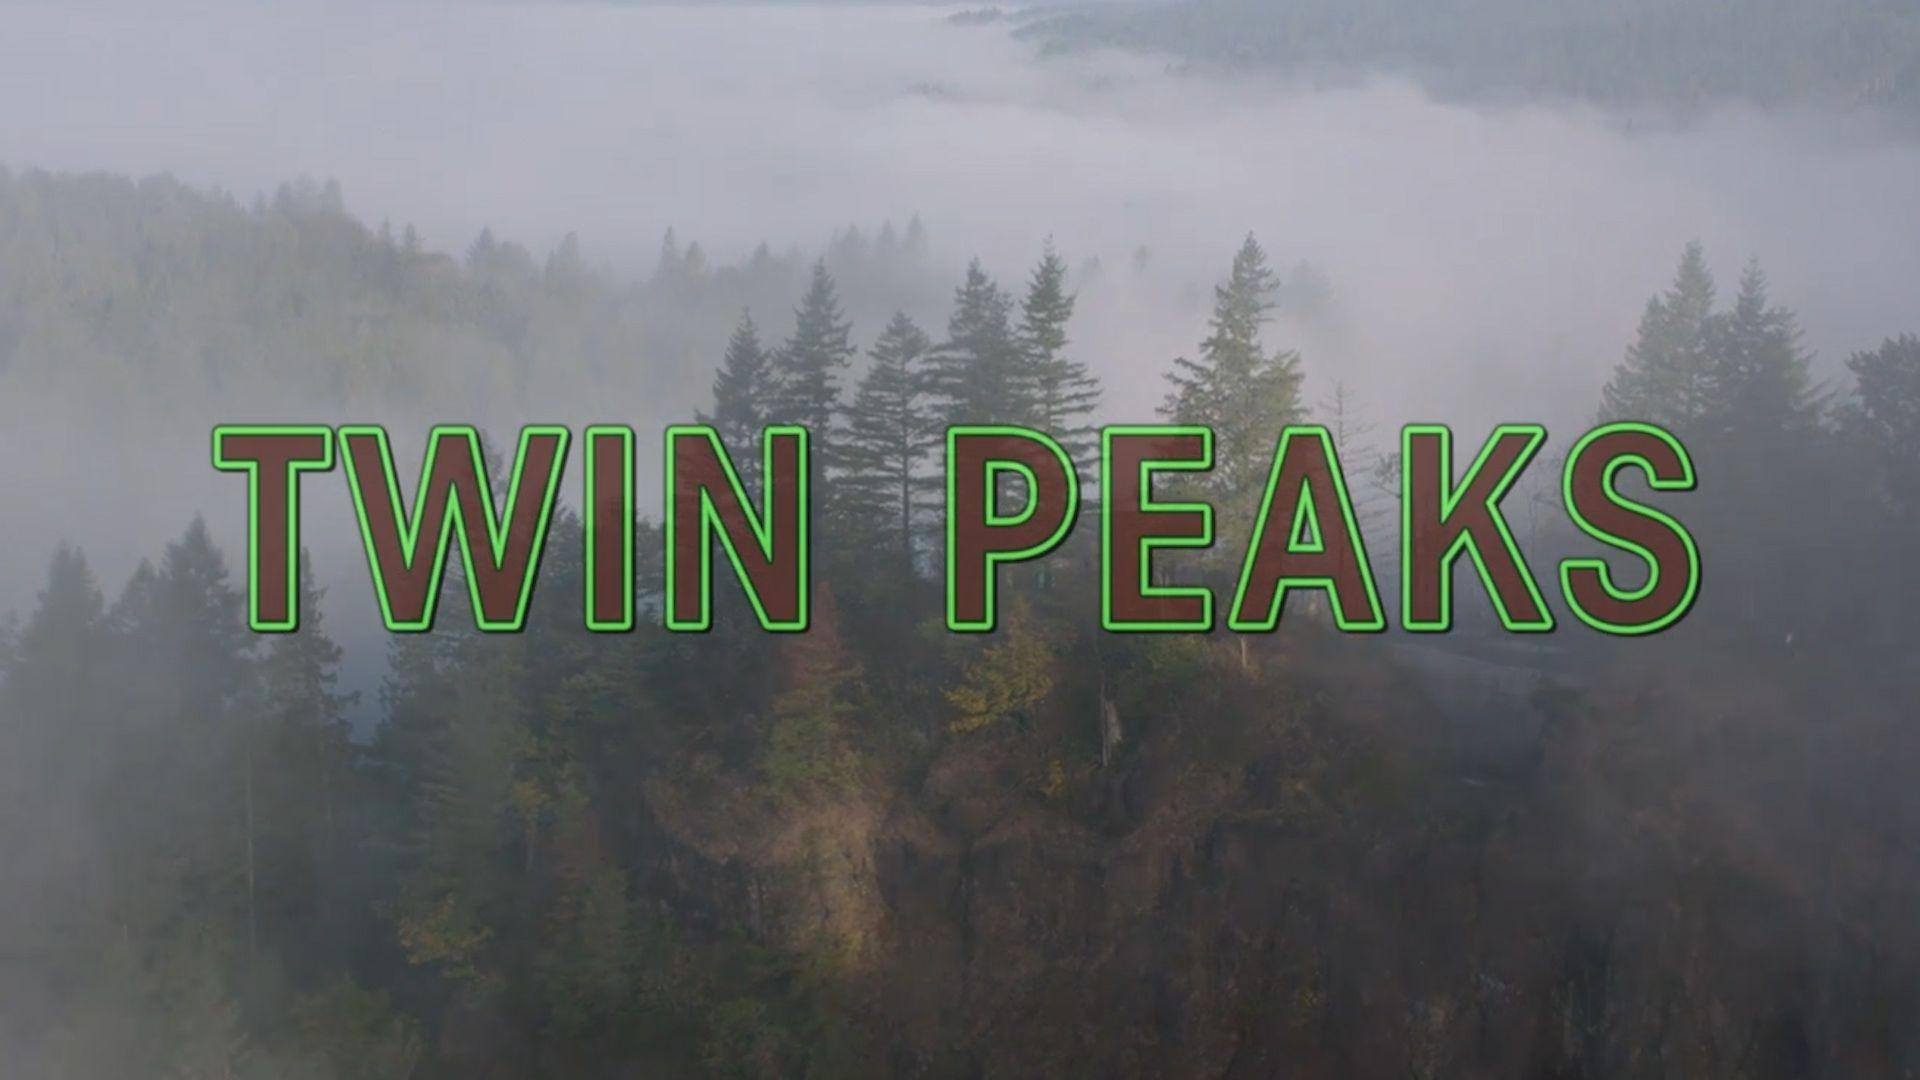 Twin Peaks Wallpaper (73+ images)